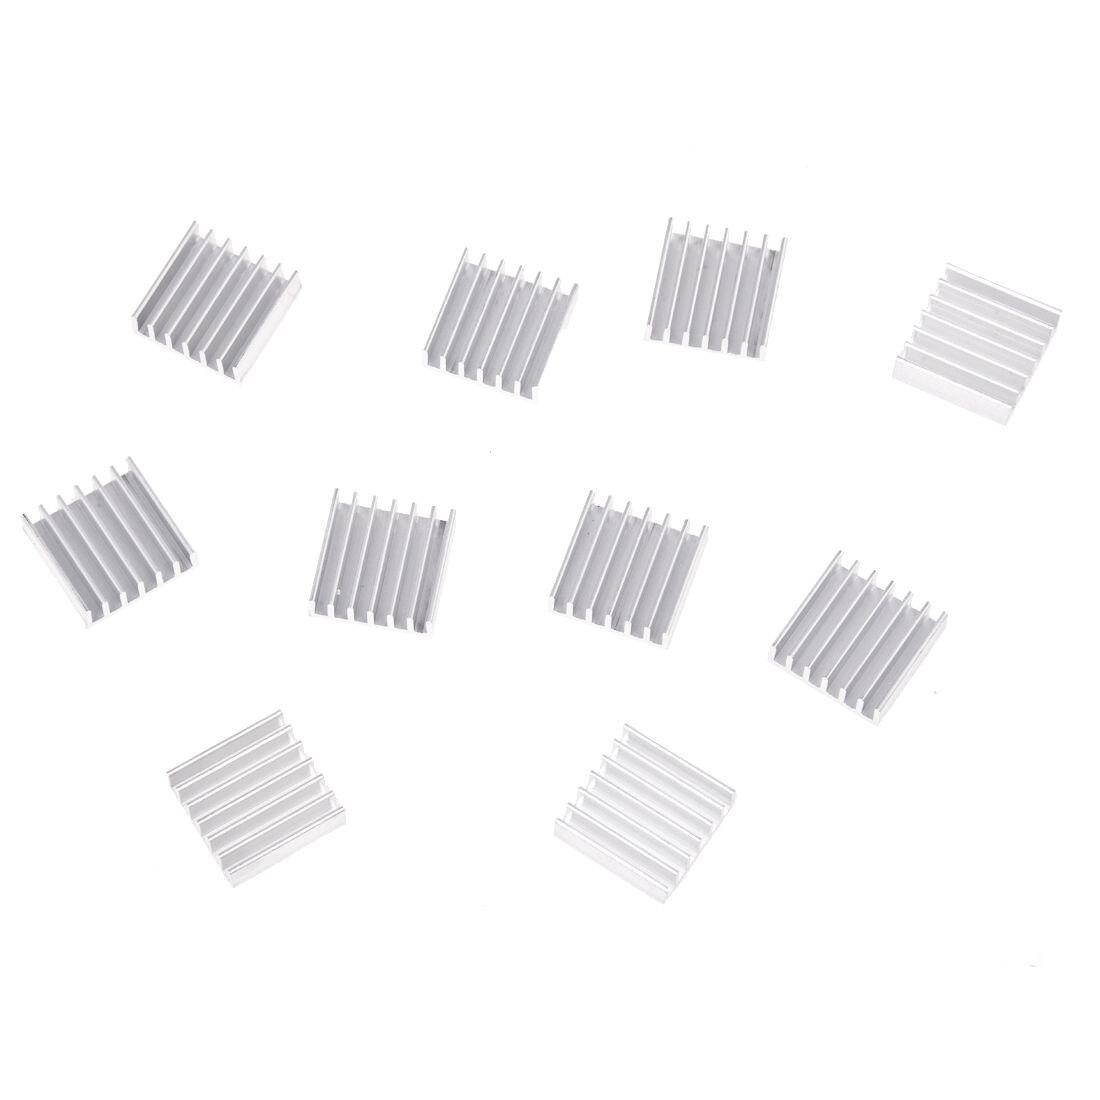 10 Pcs 20mm X 20mm X 6mm Aluminum Heatsink For Ic Mosfet